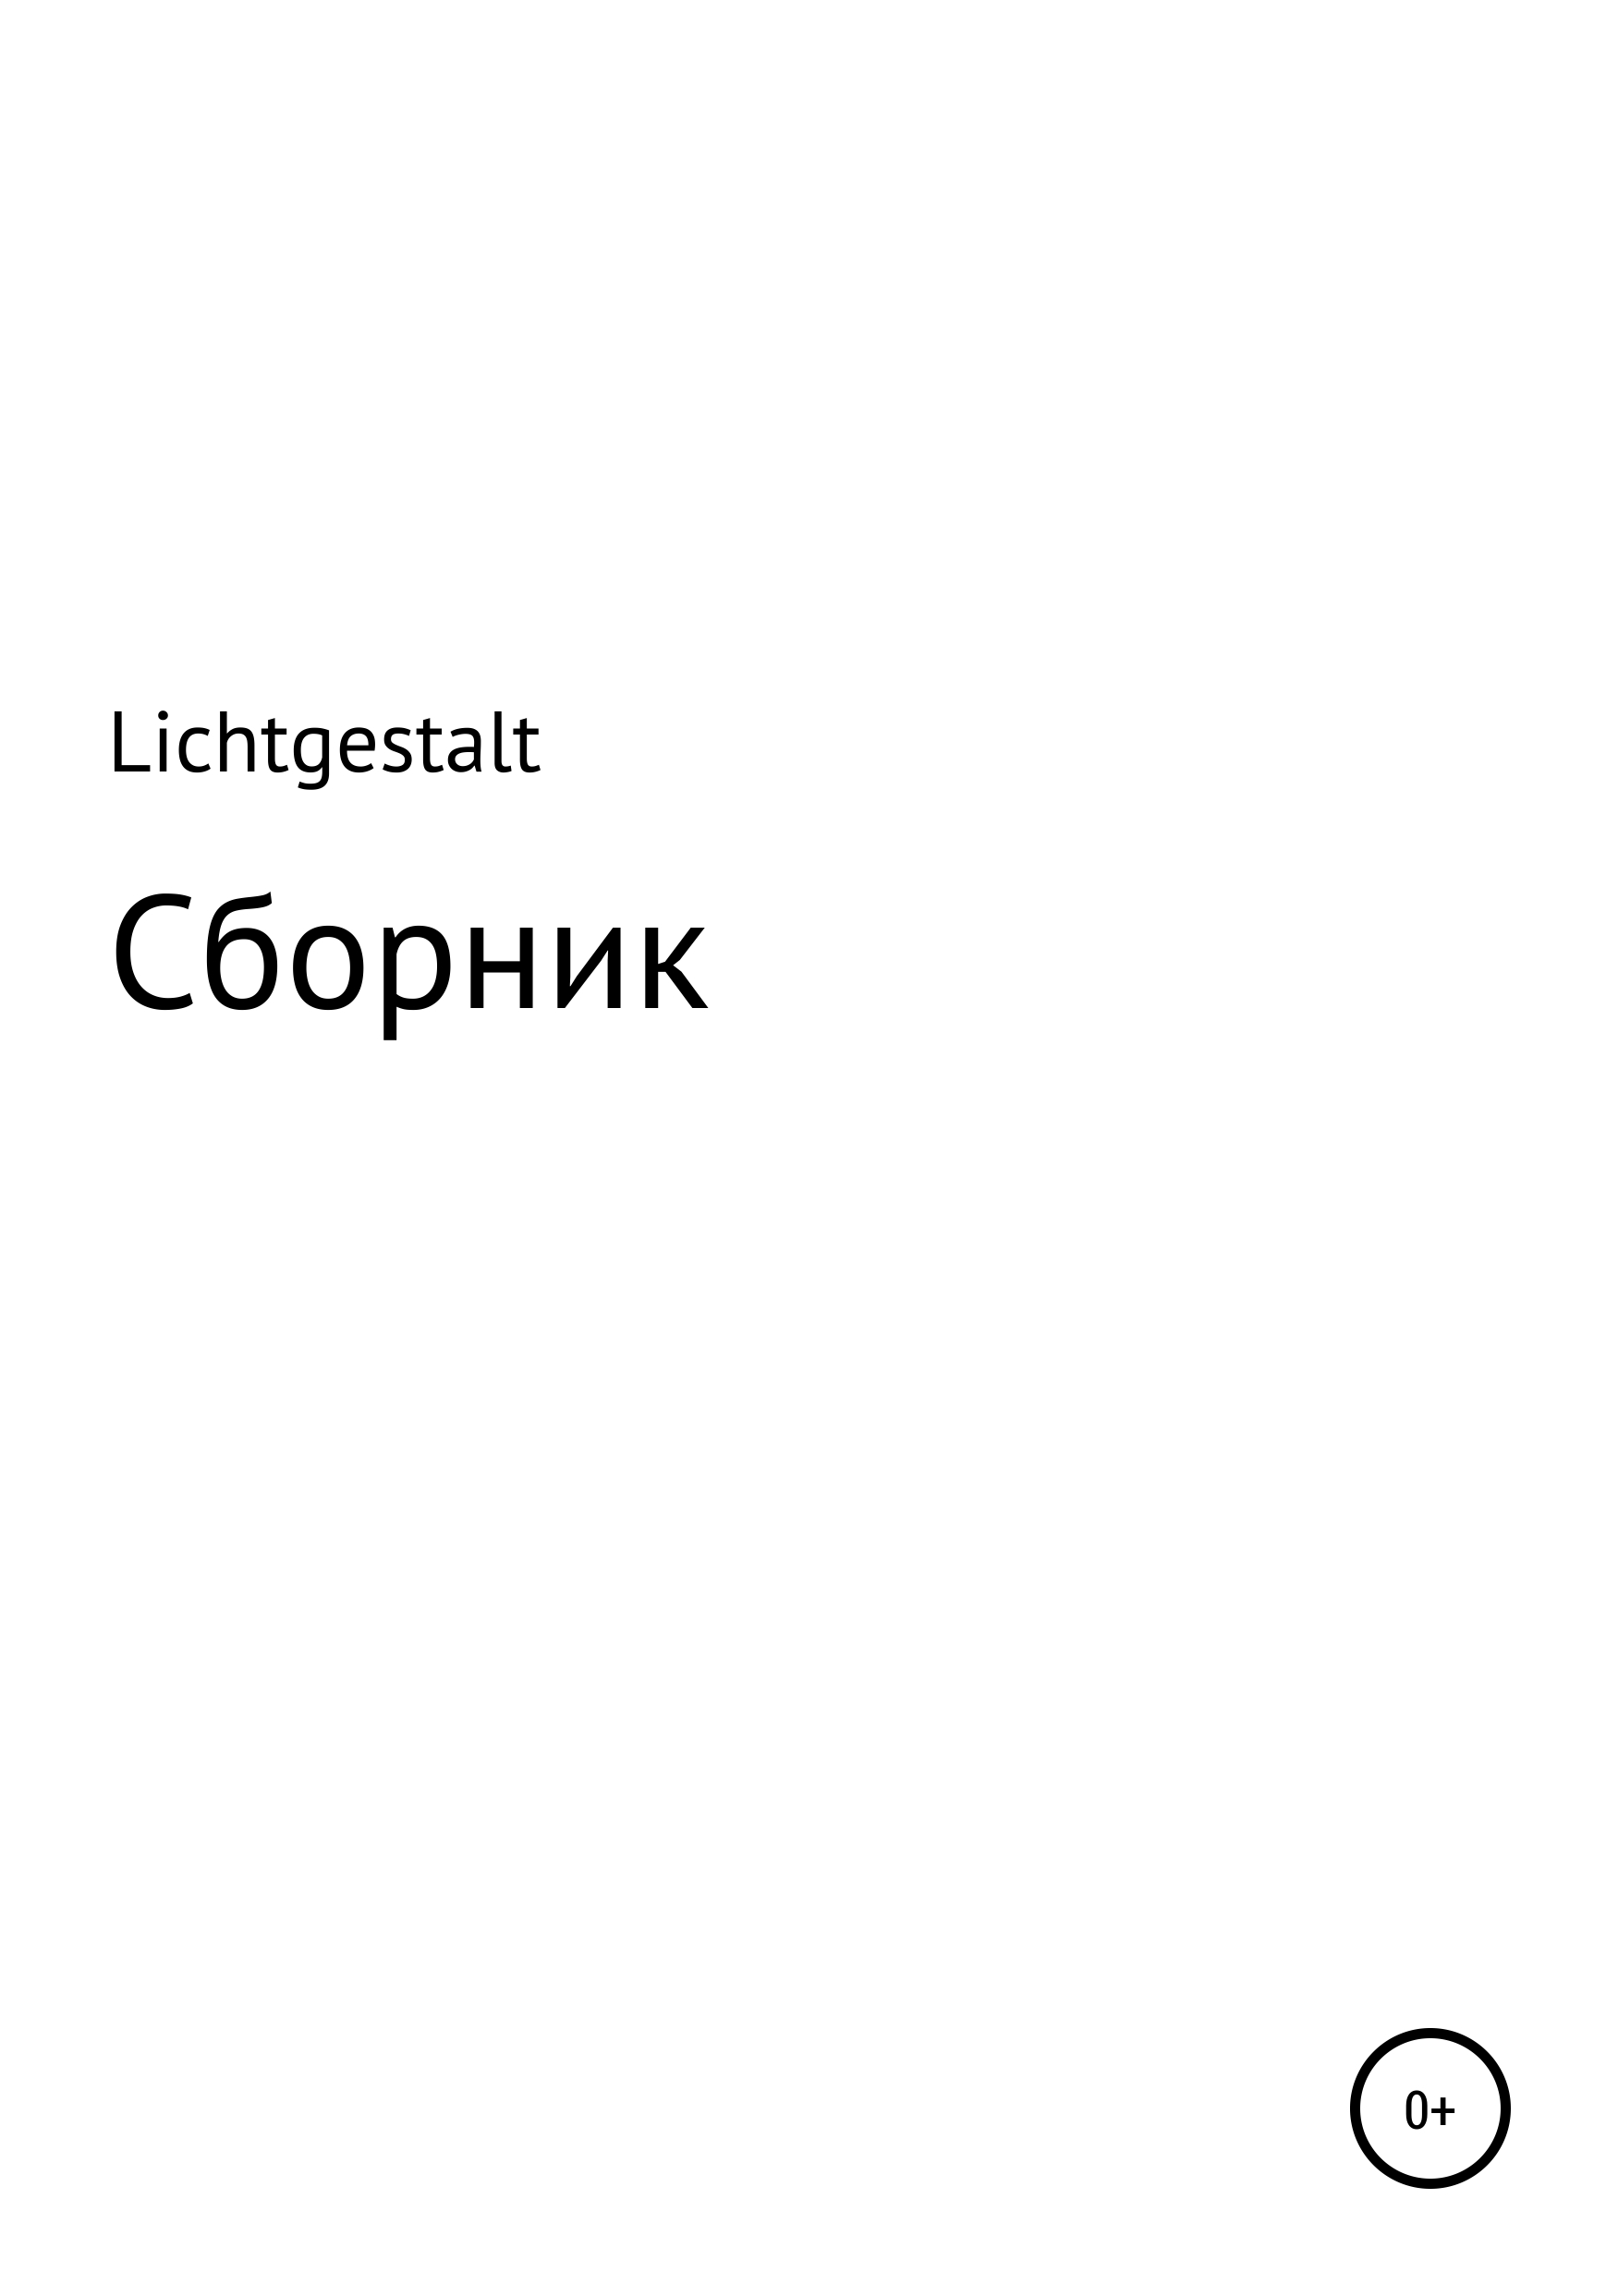 Lichtgestalt: Сборник